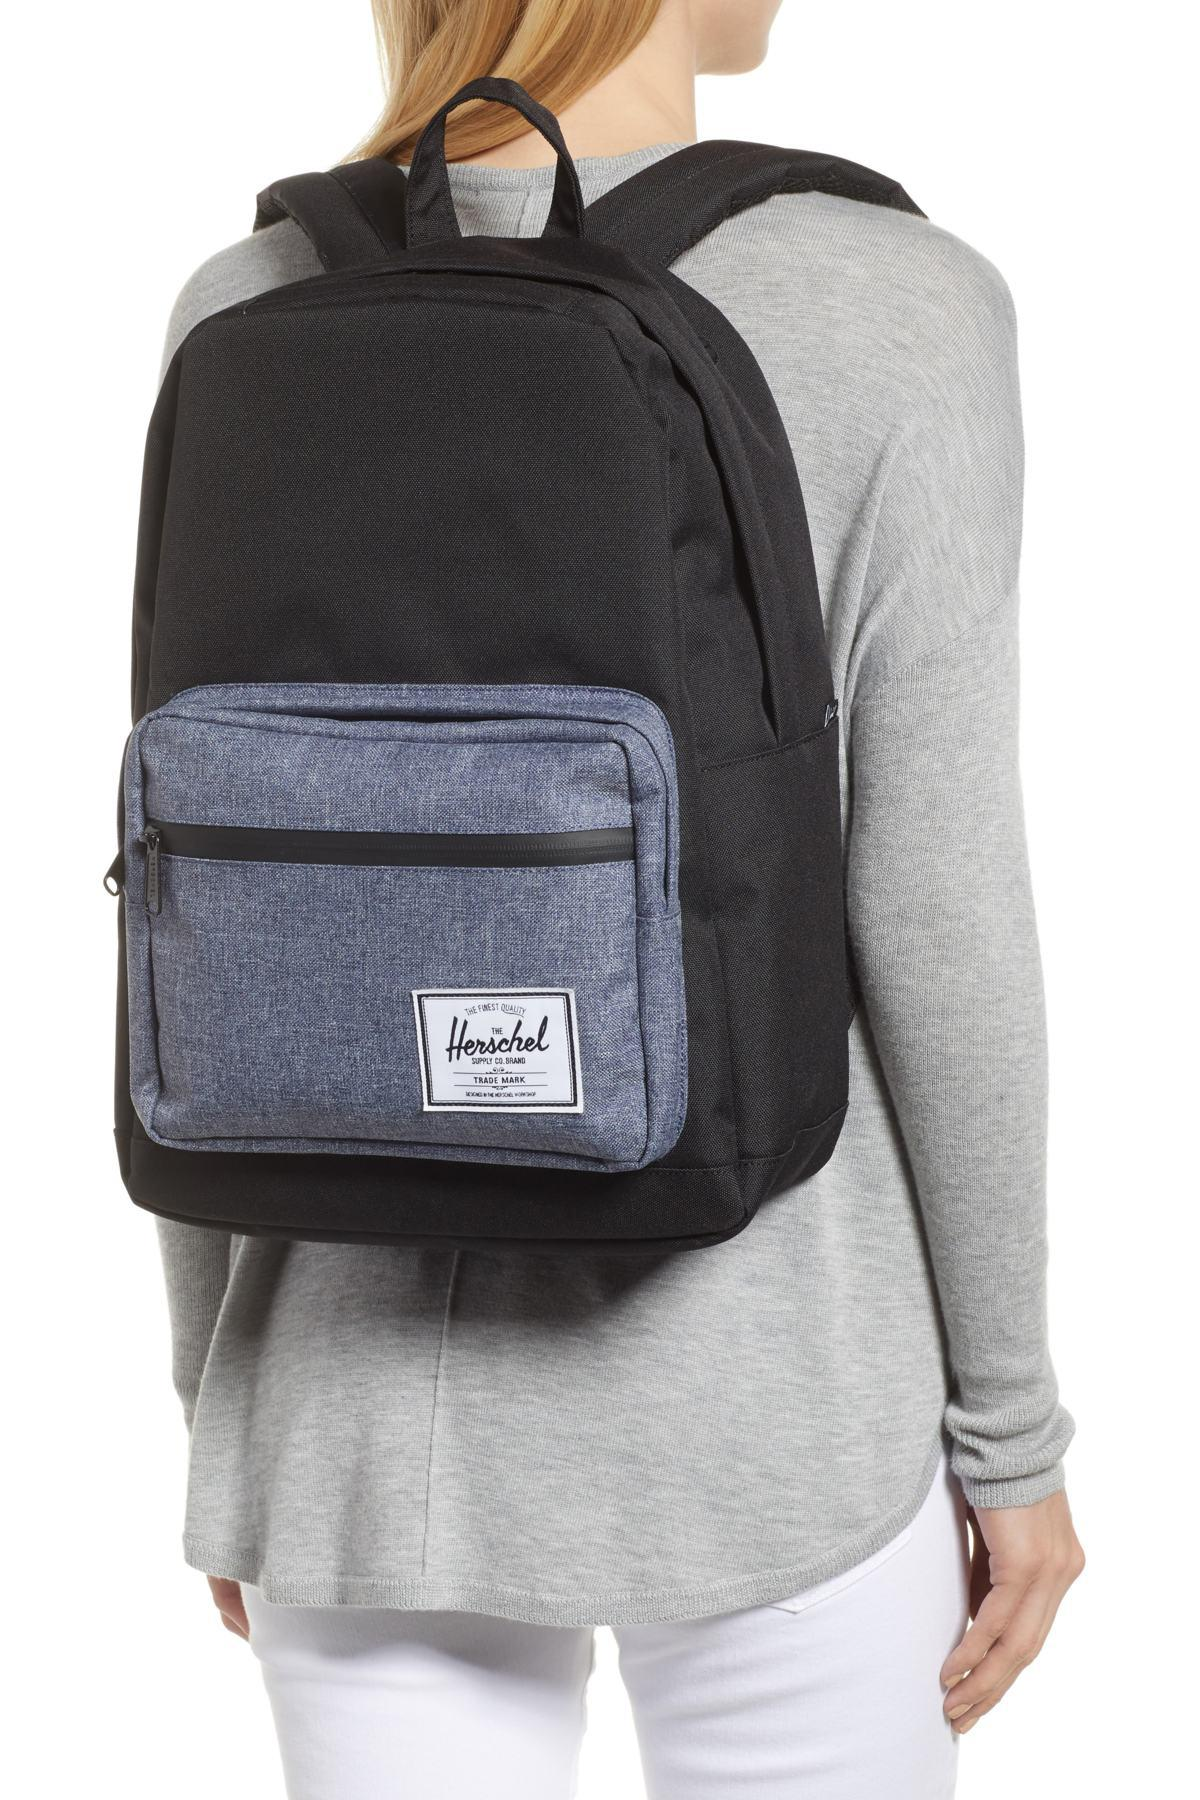 37b9cd35d39e Herschel Supply Co. - Black Pop Quiz - Chambray Backpack for Men - Lyst.  View fullscreen